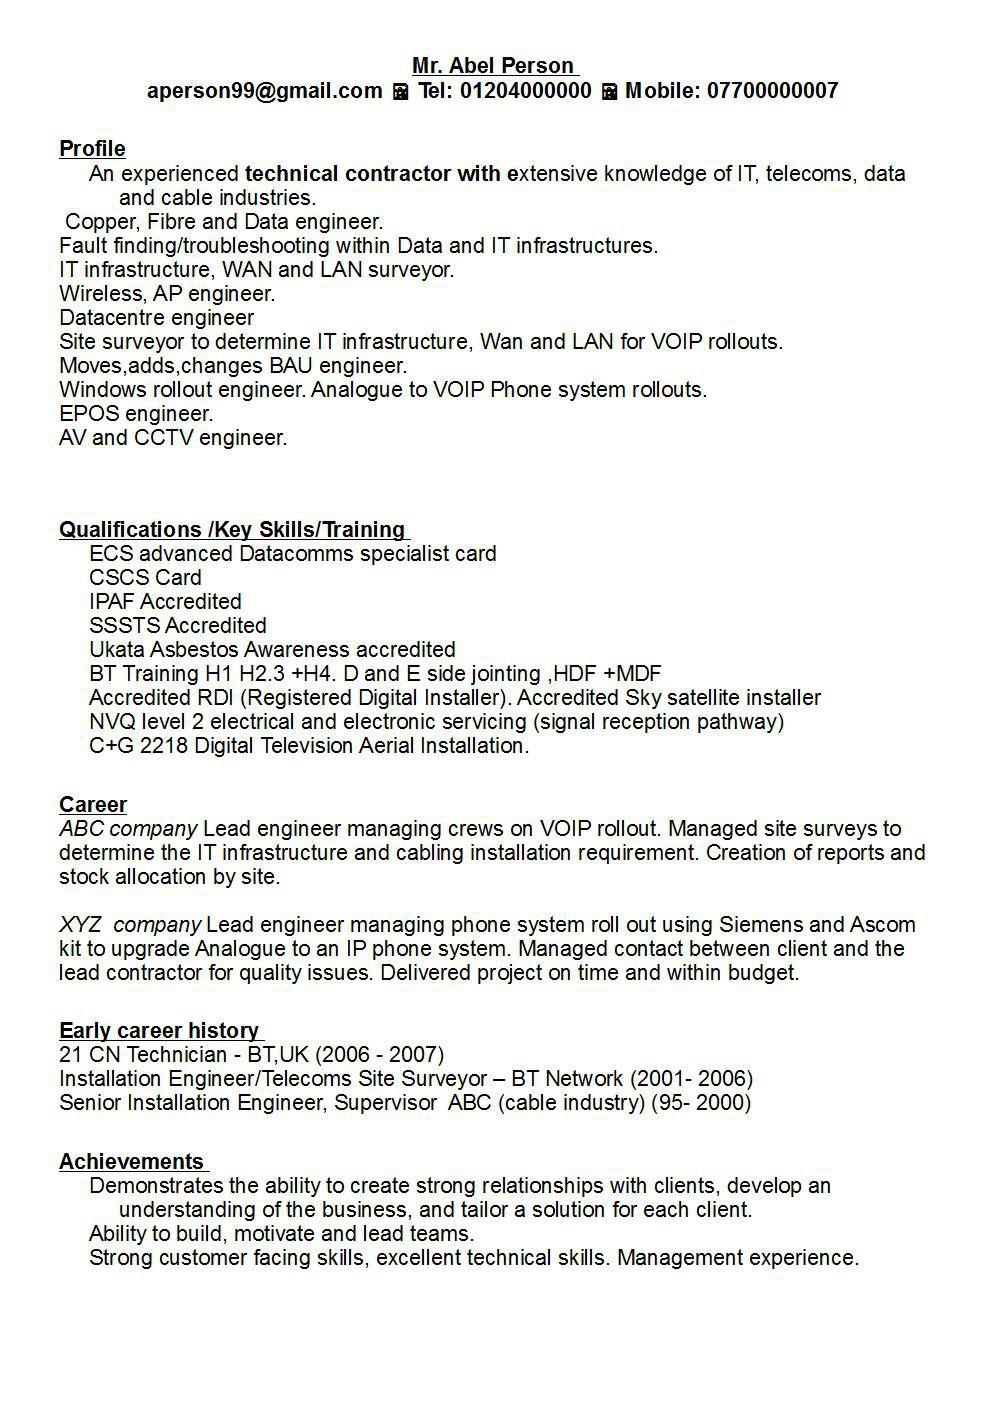 Cv Template Key Achievements Resume examples, Cv